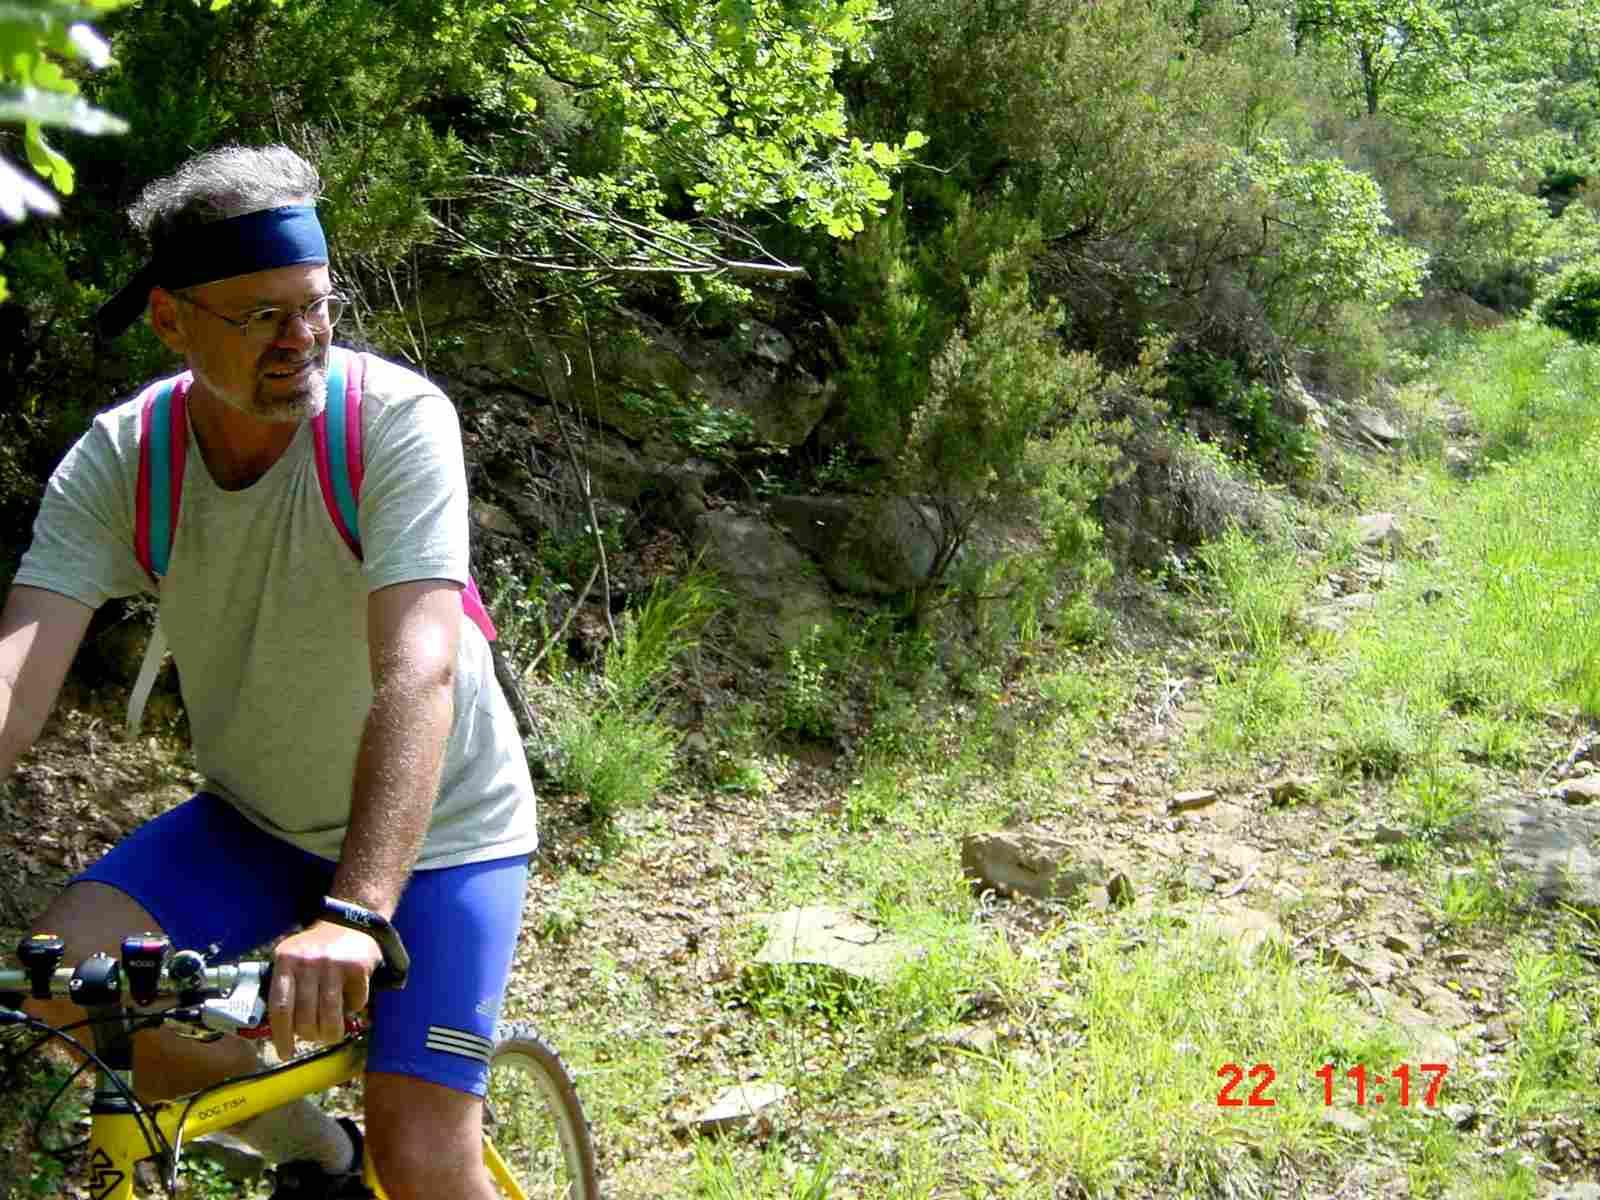 Foto 4 zur Tour: Monte Castel Giudeo, 1037 m